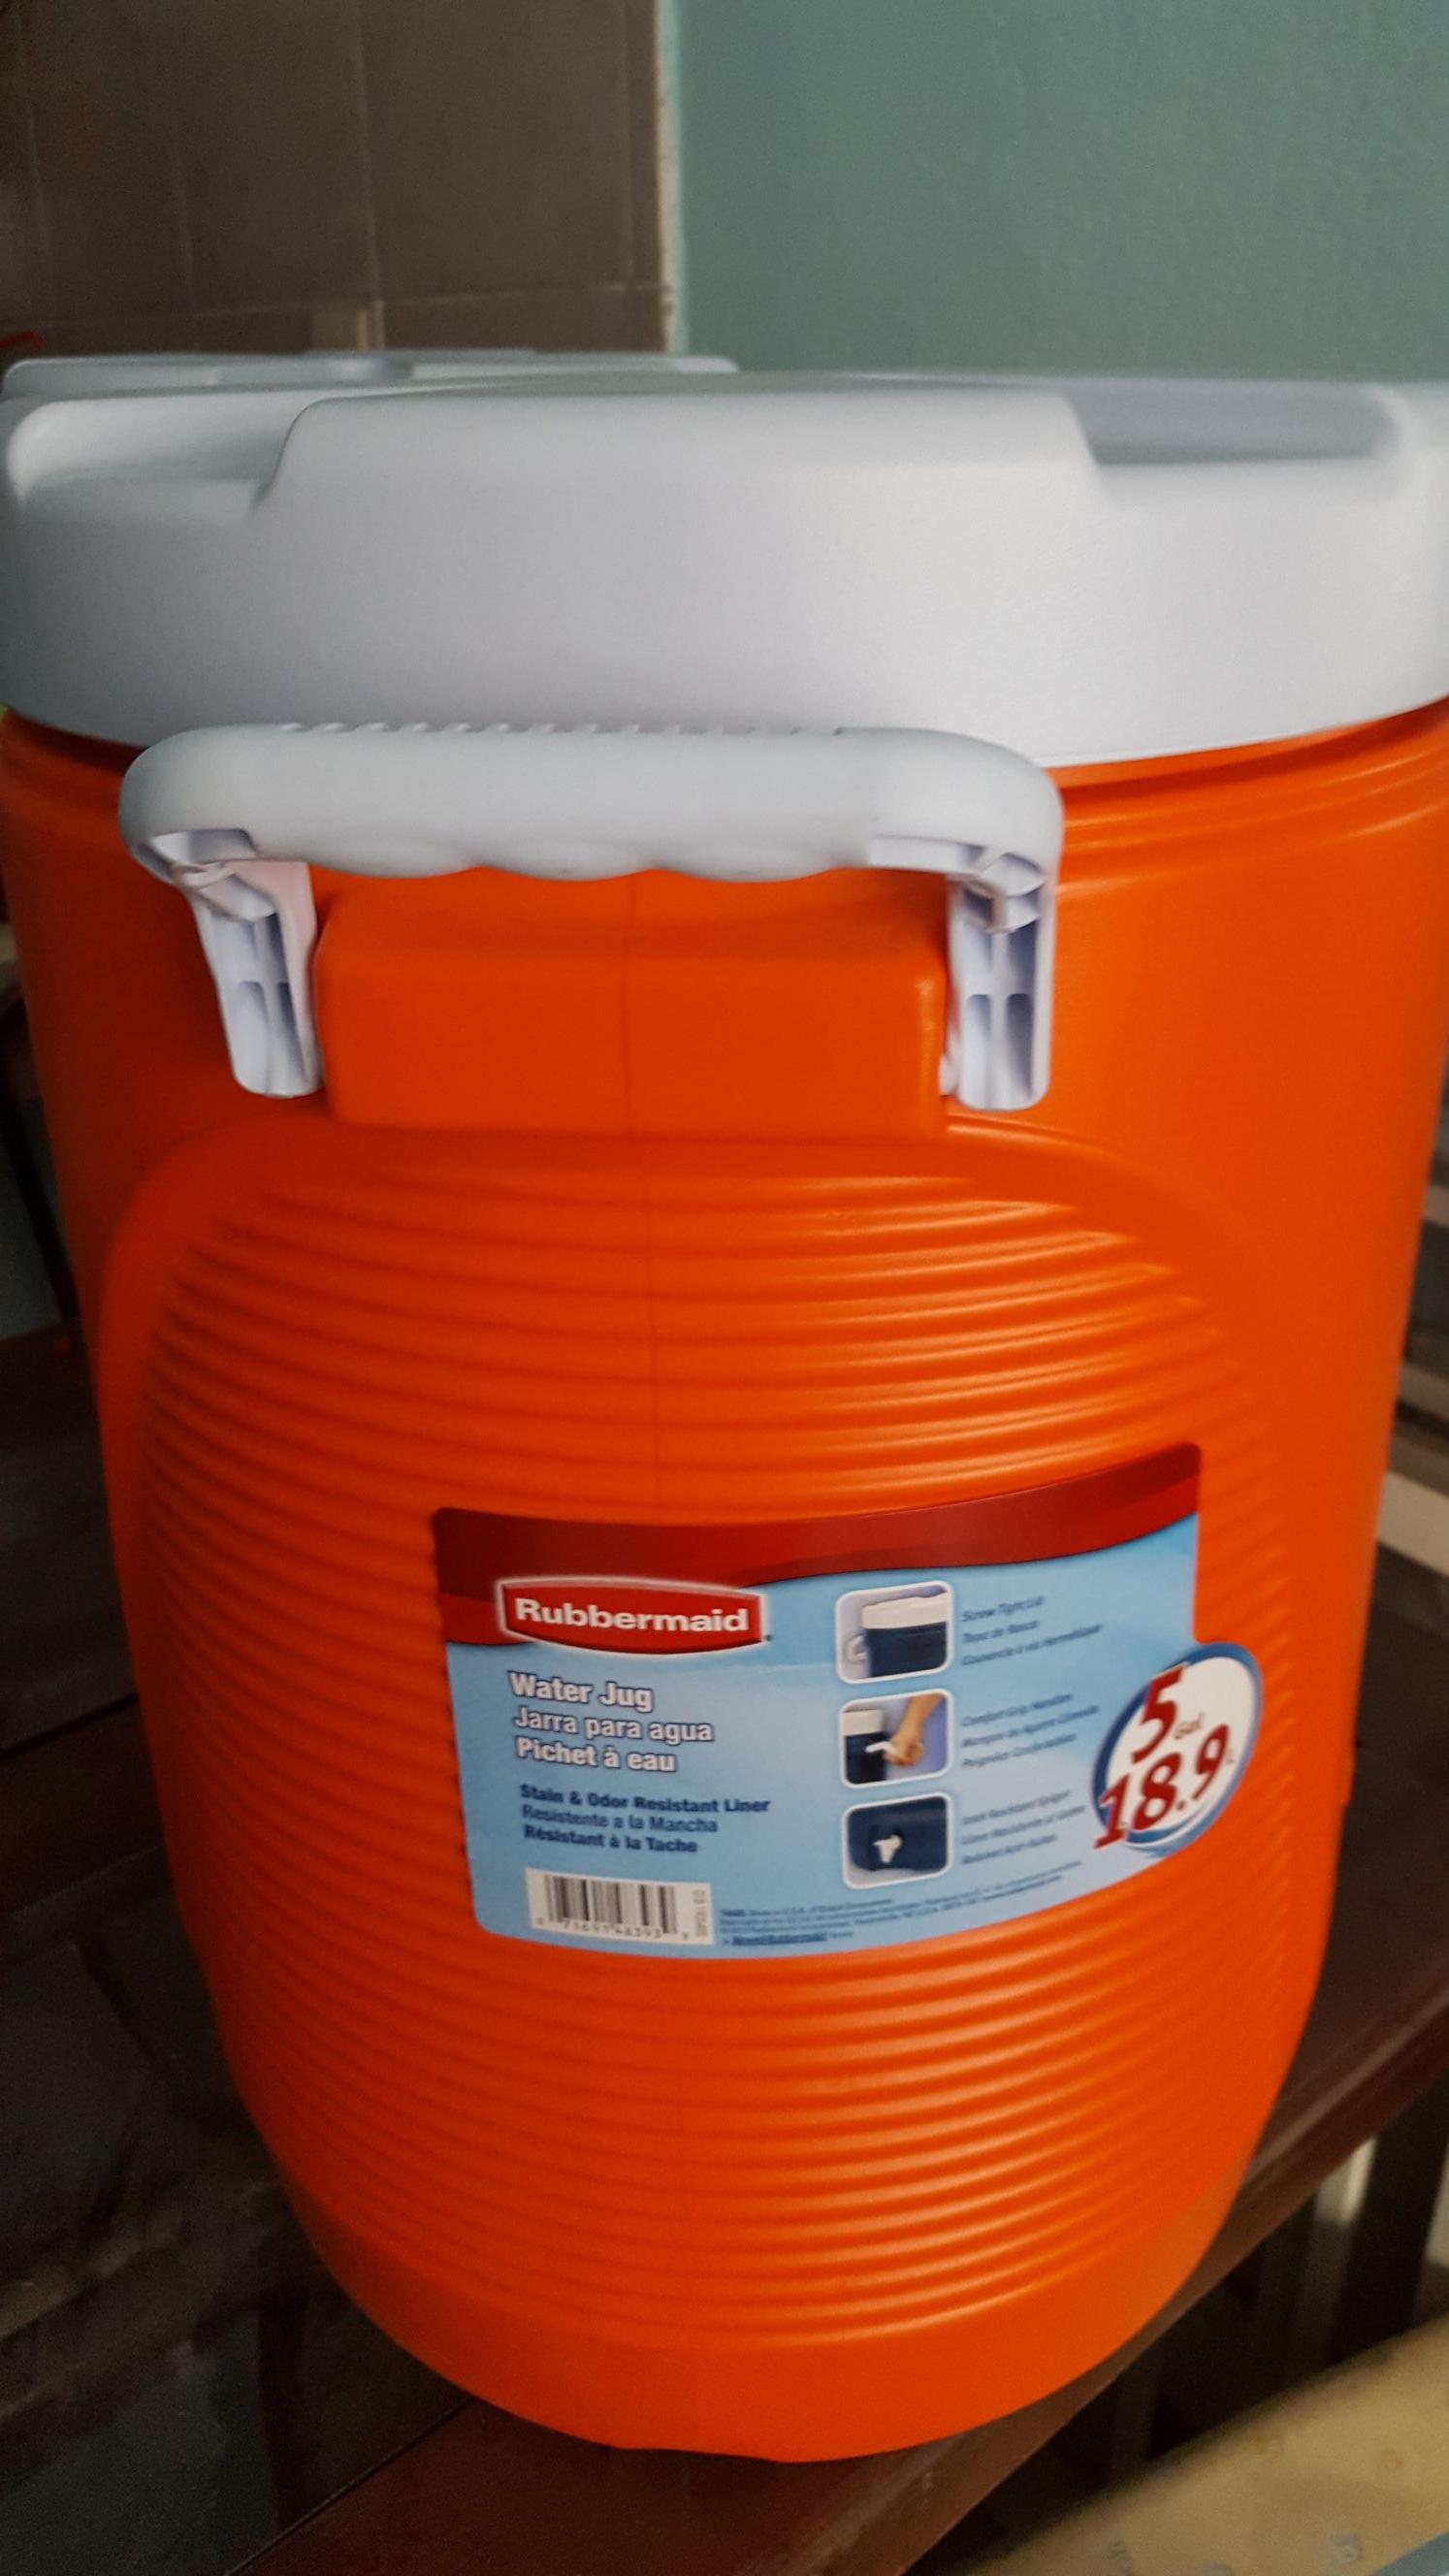 Bodega Aurrerá: termo rubbermaid 5 galones